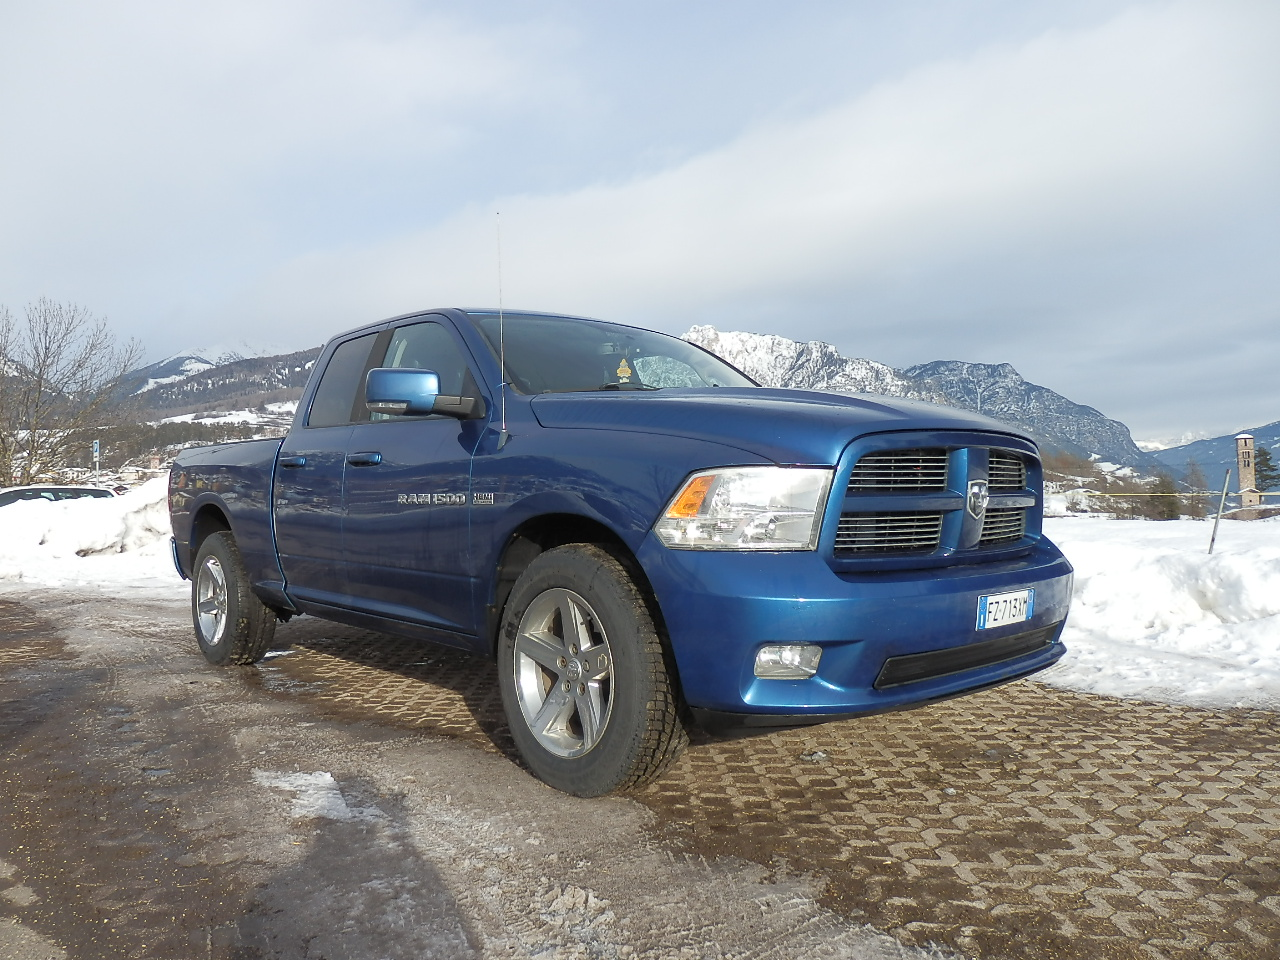 Dodge - RAM 1500 - Km 205700 - Euro 24800